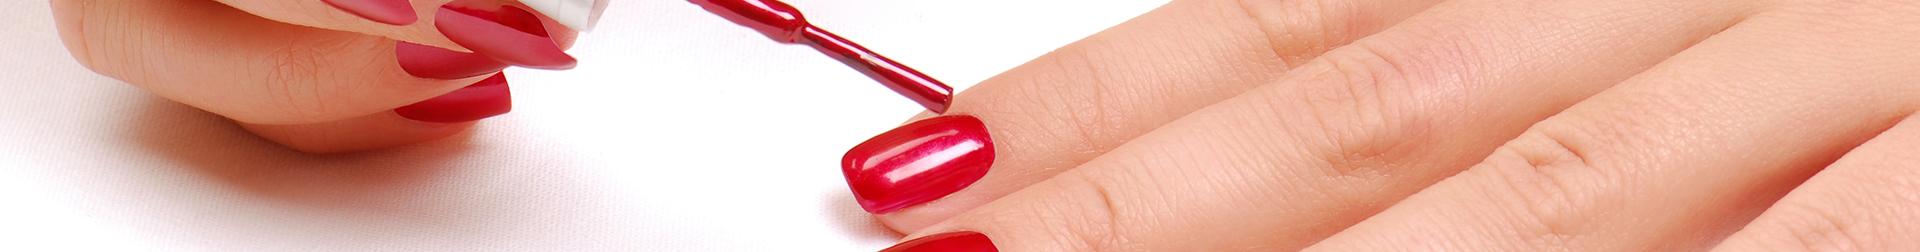 Nail Makeup Products | Buy Nail Polish Online - Top Brands | AromaCraze